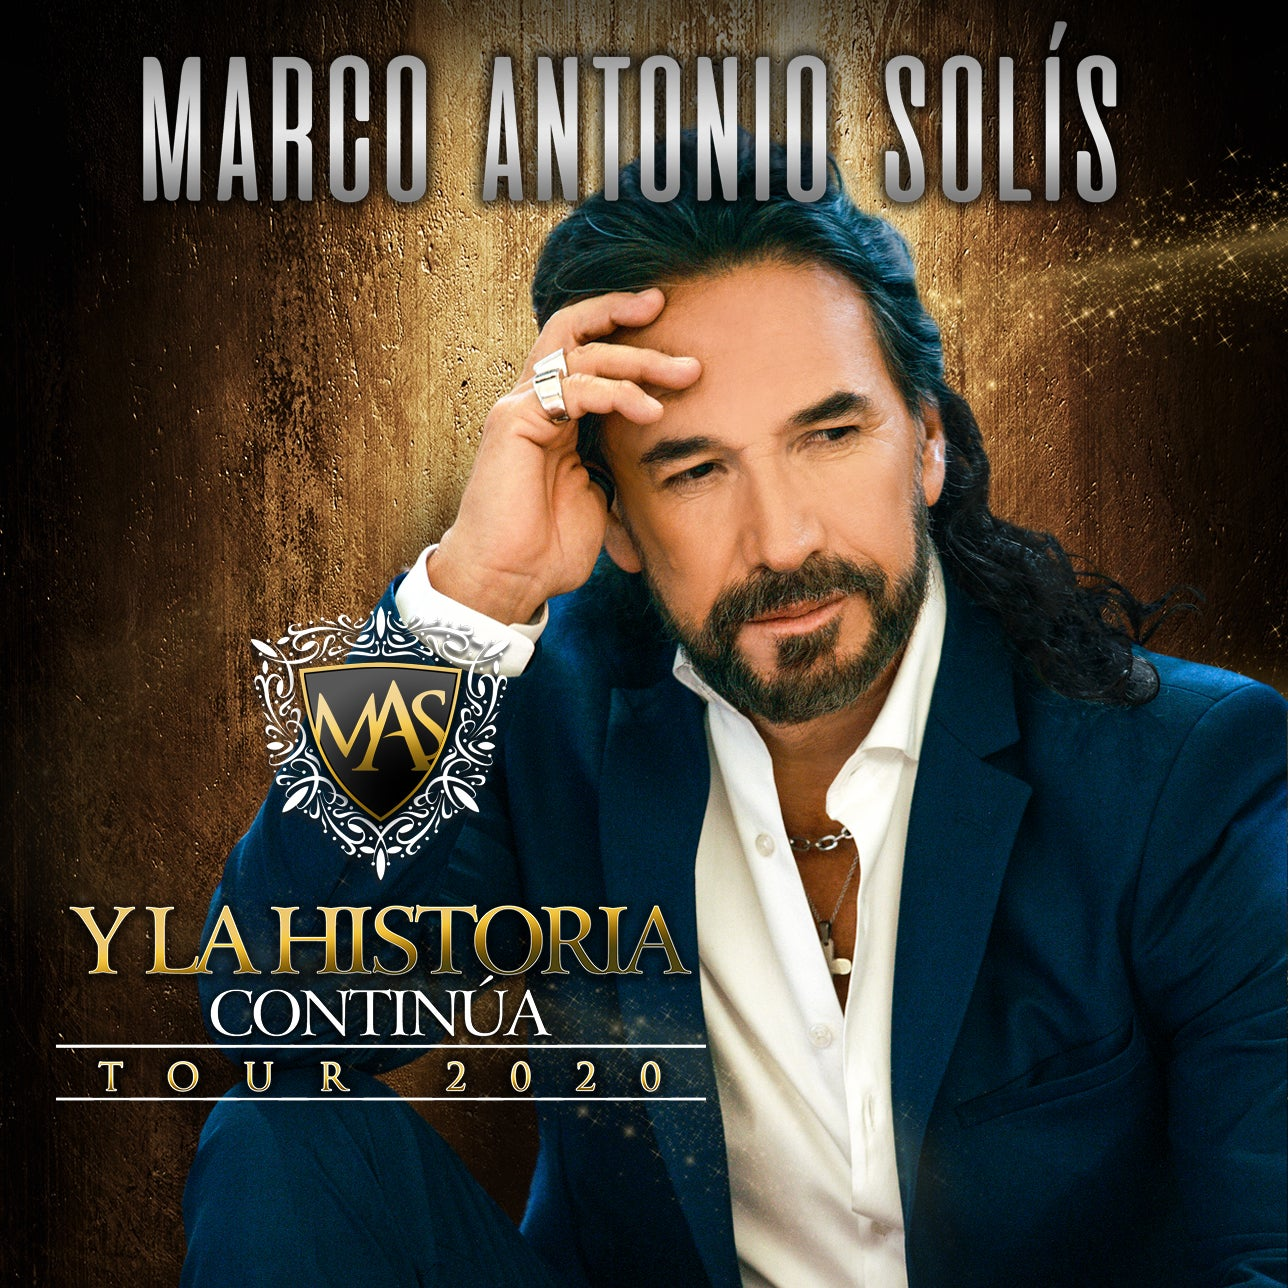 Rescheduled - Marco Antonio Solís